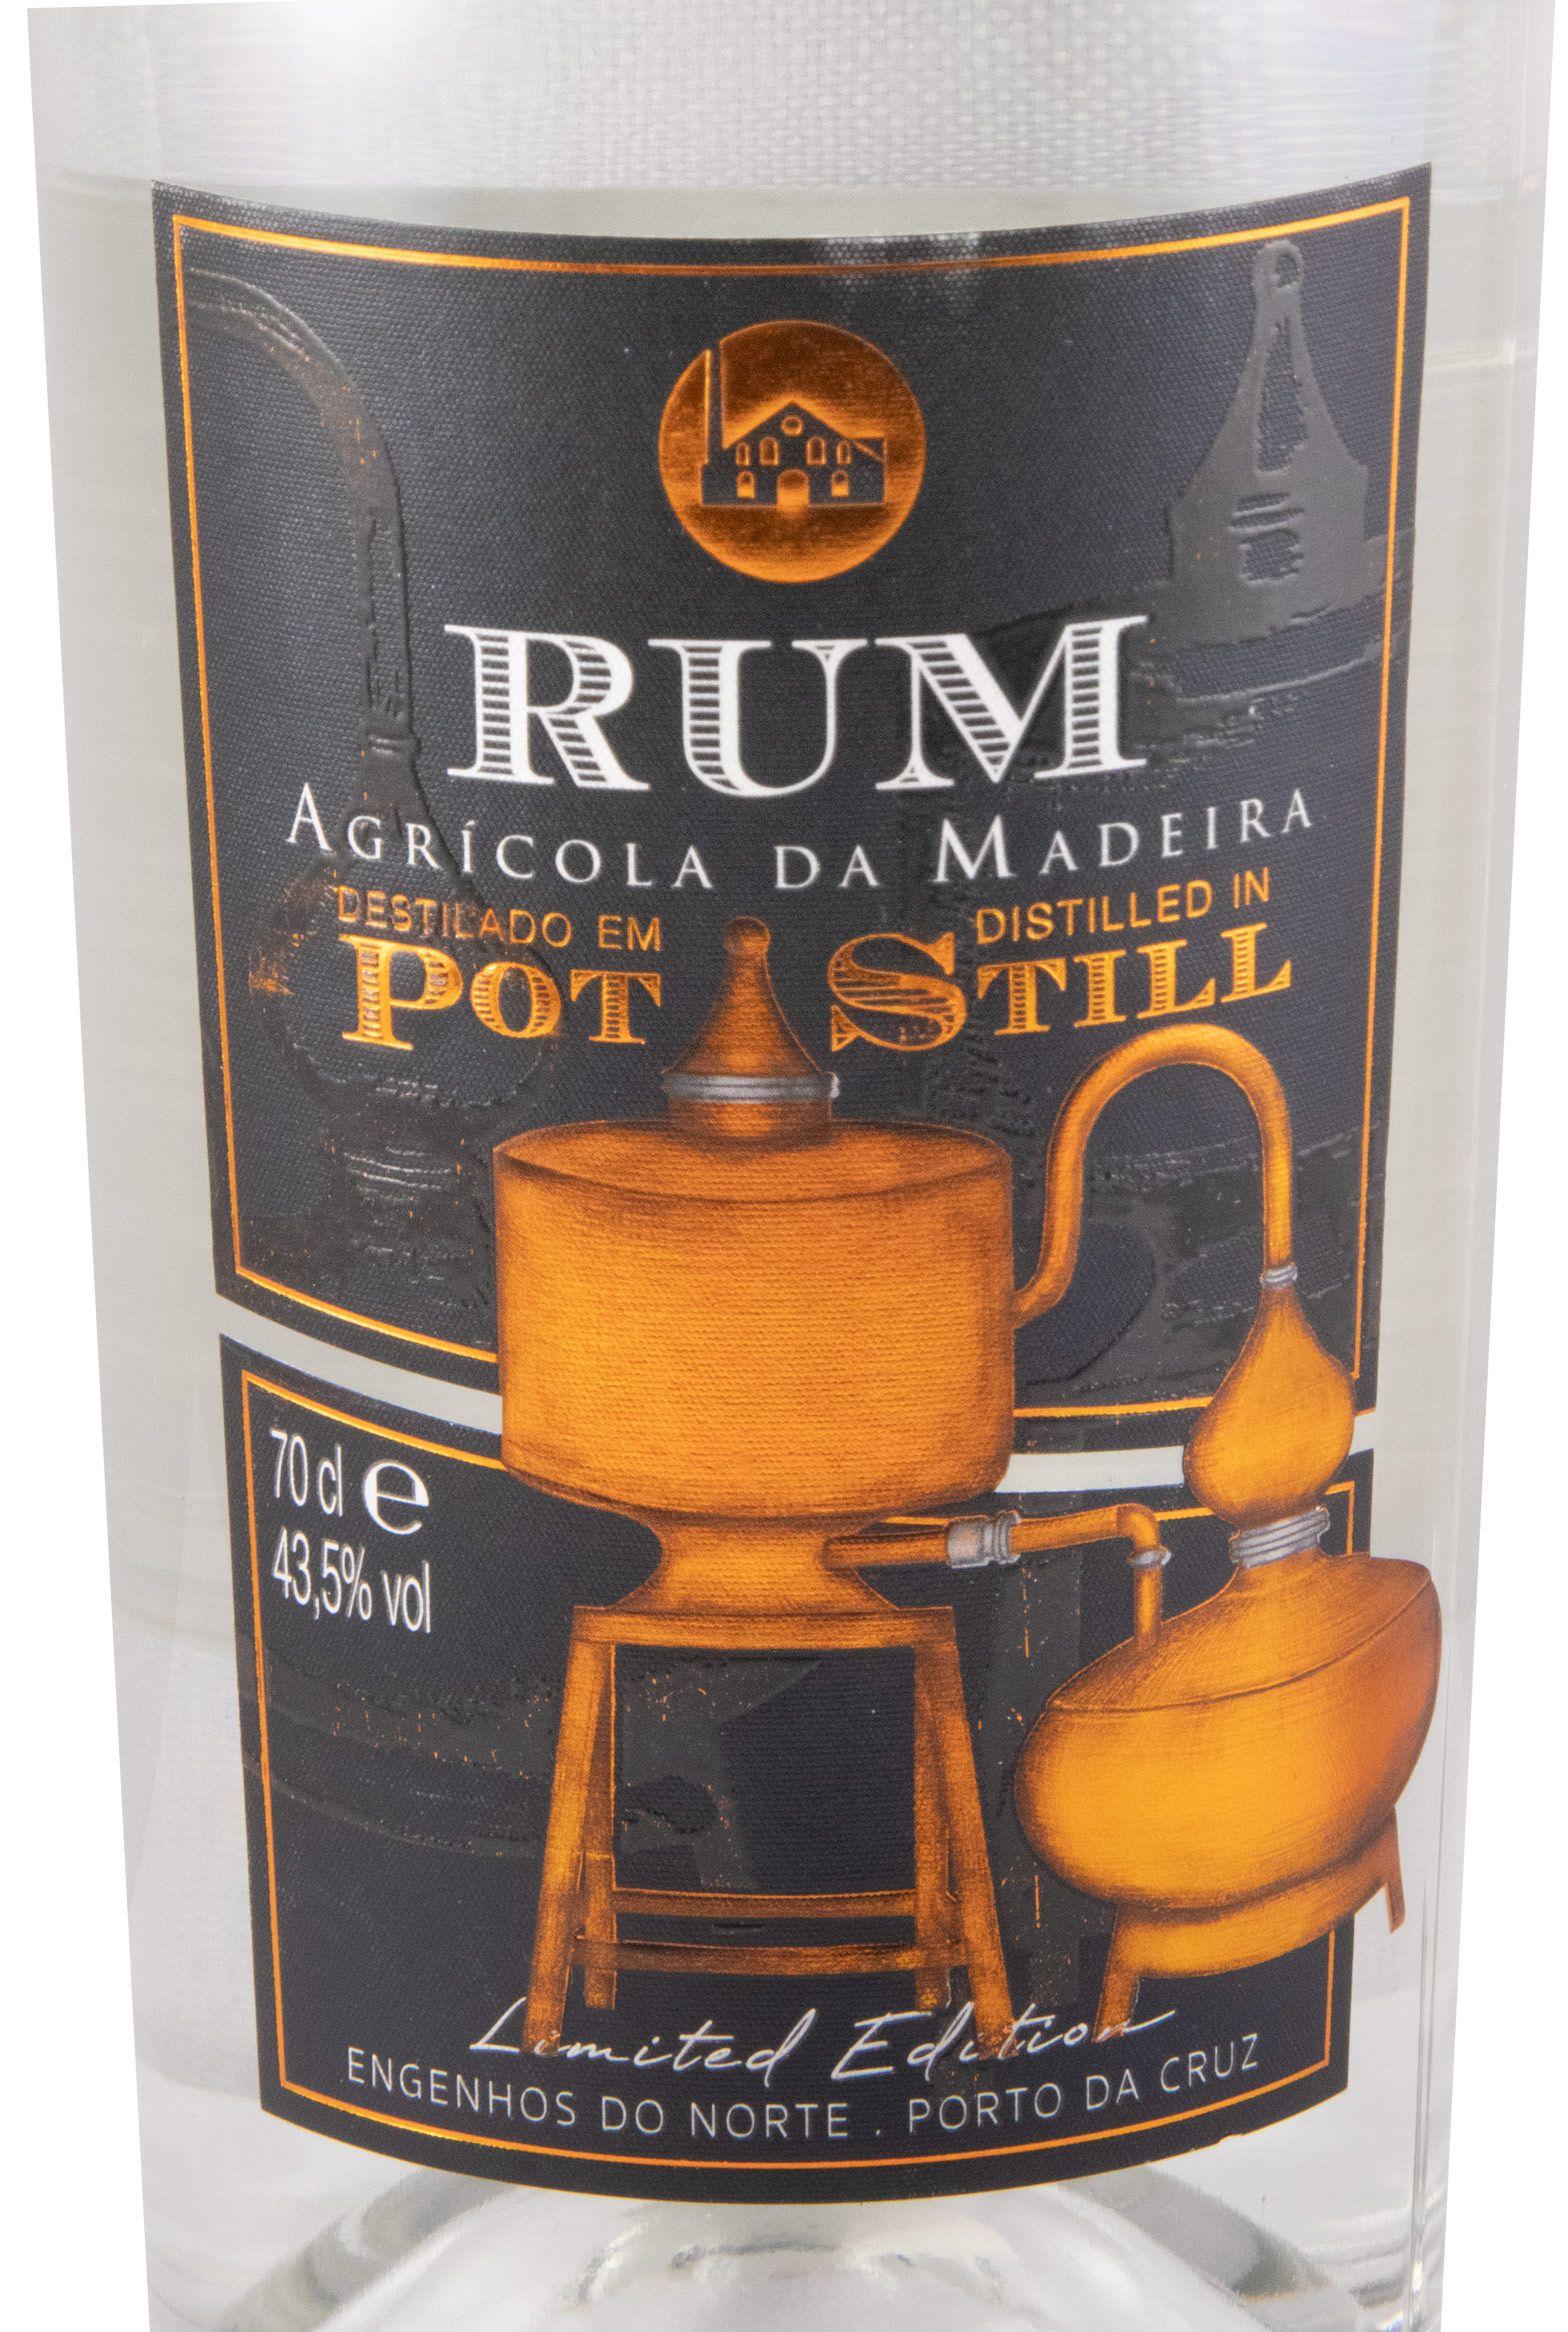 Rum Agrícola da Madeira Pot Still